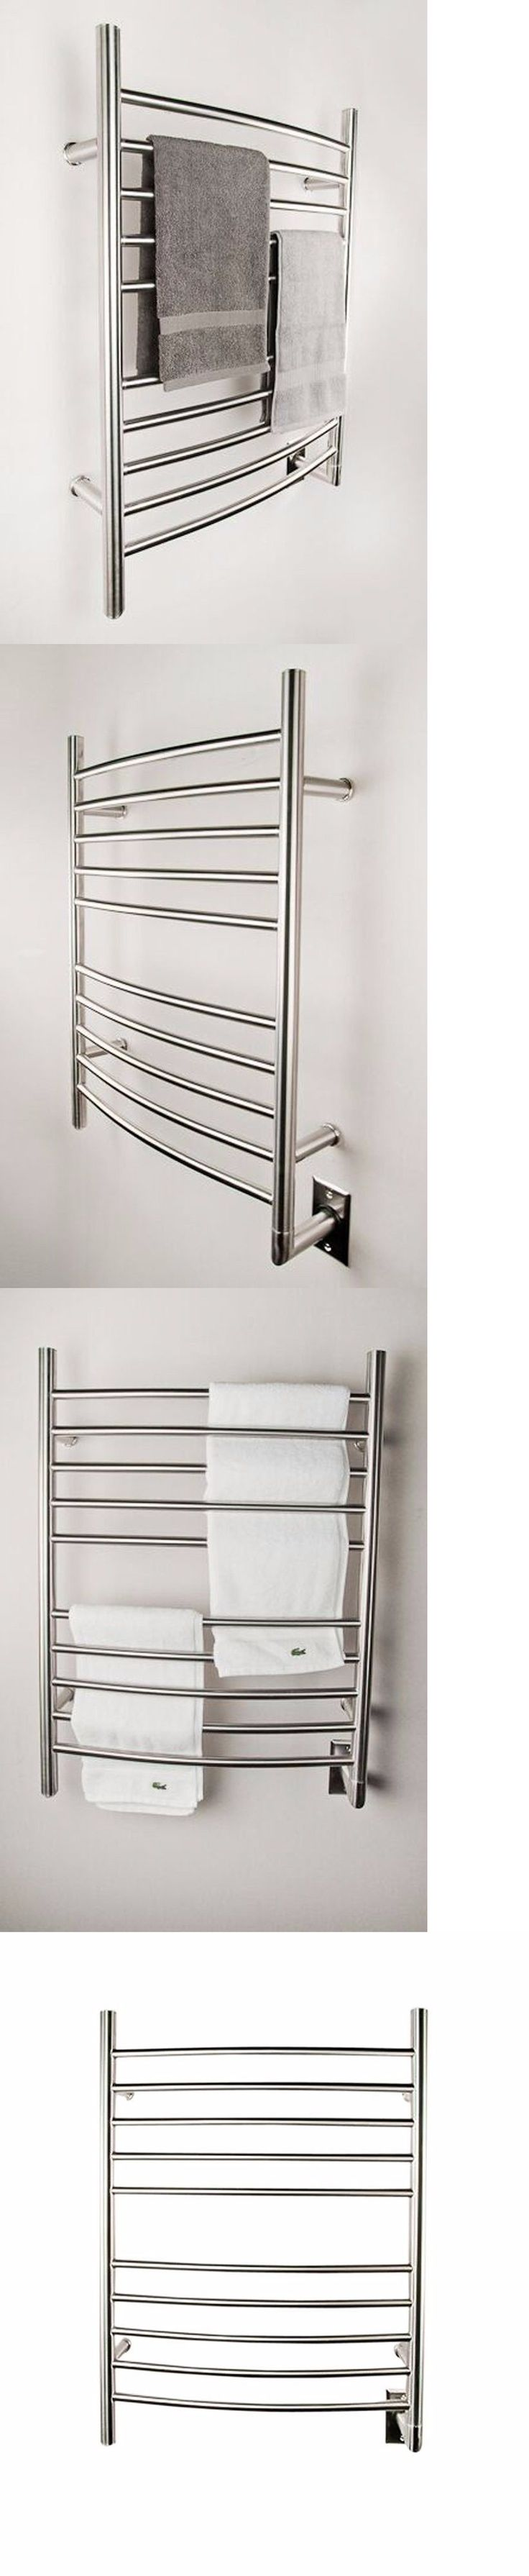 Awesome Amba Towel Warmers for Best Tower Warmer Inspiration: Warming Towel Rack | Towel Warmer Wall Mount | Amba Towel Warmers